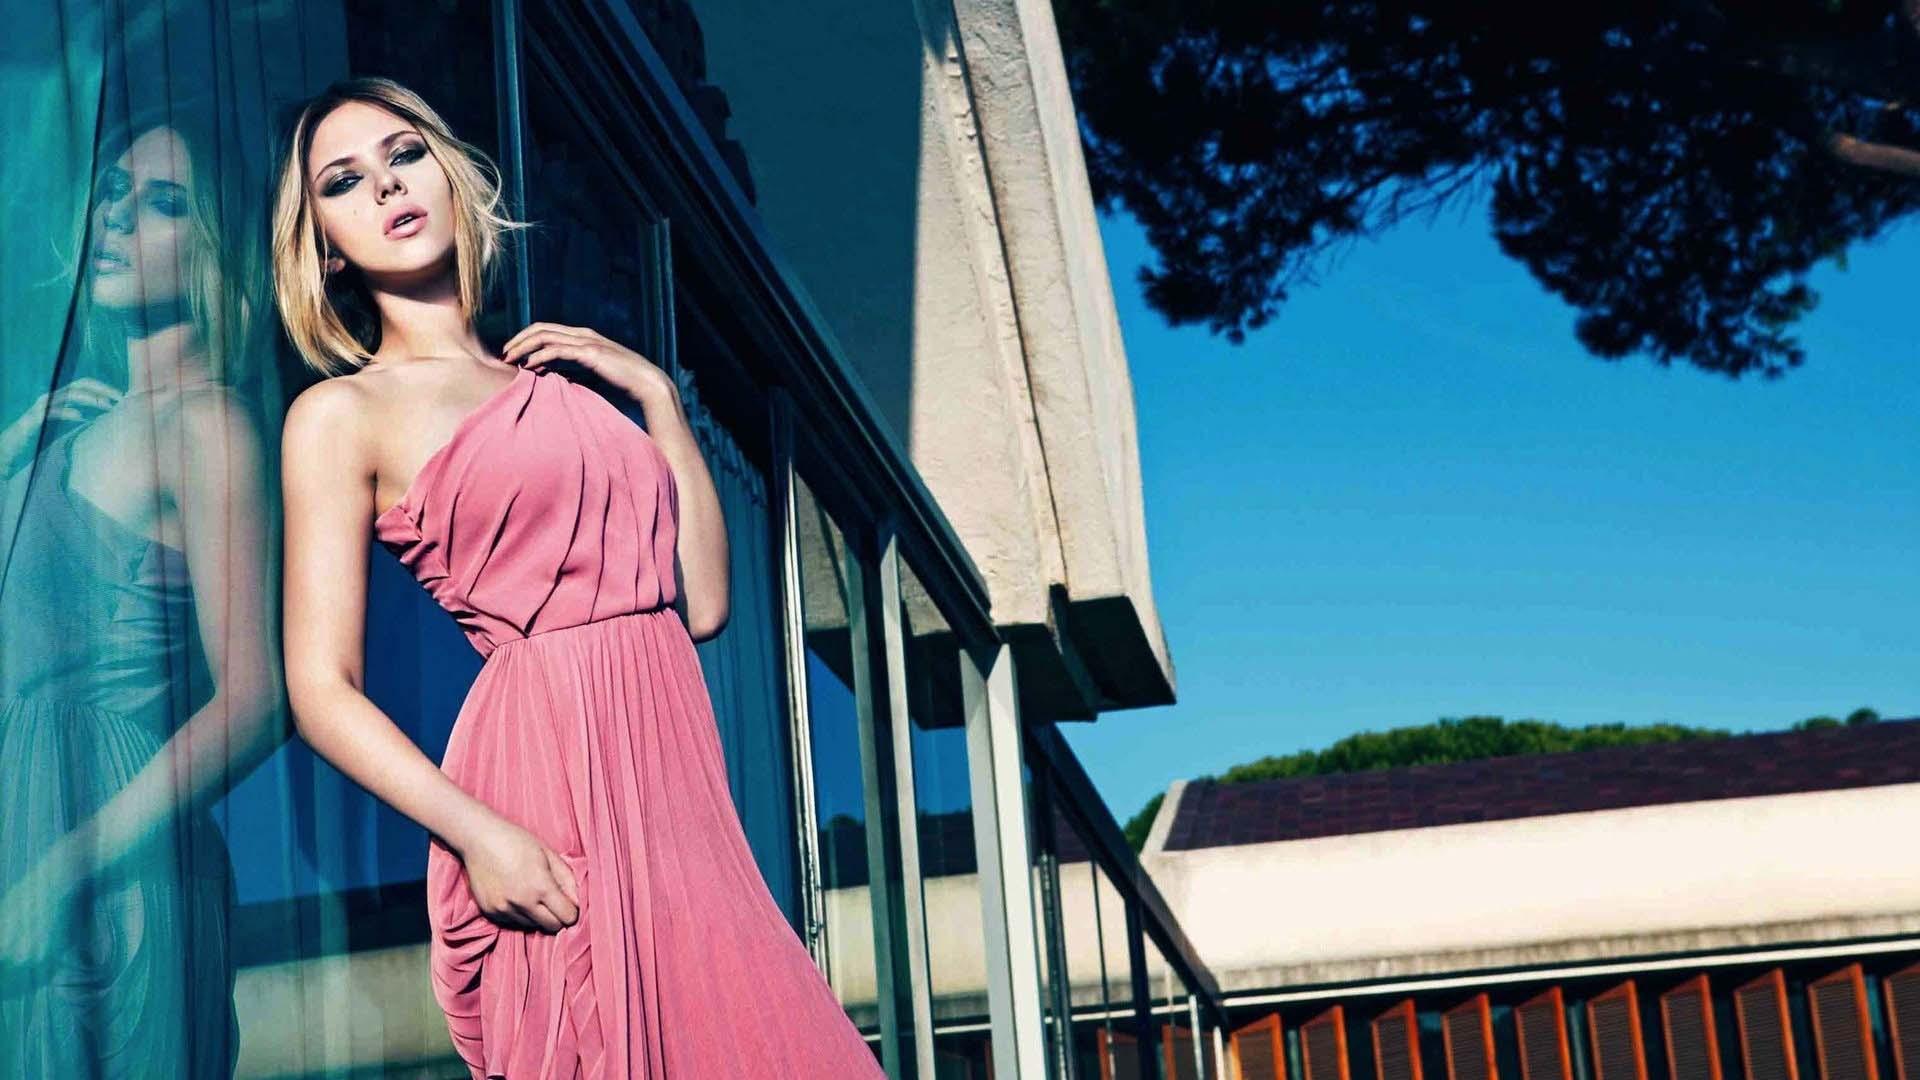 scarlett johansson pink outfit wallpaper 65783